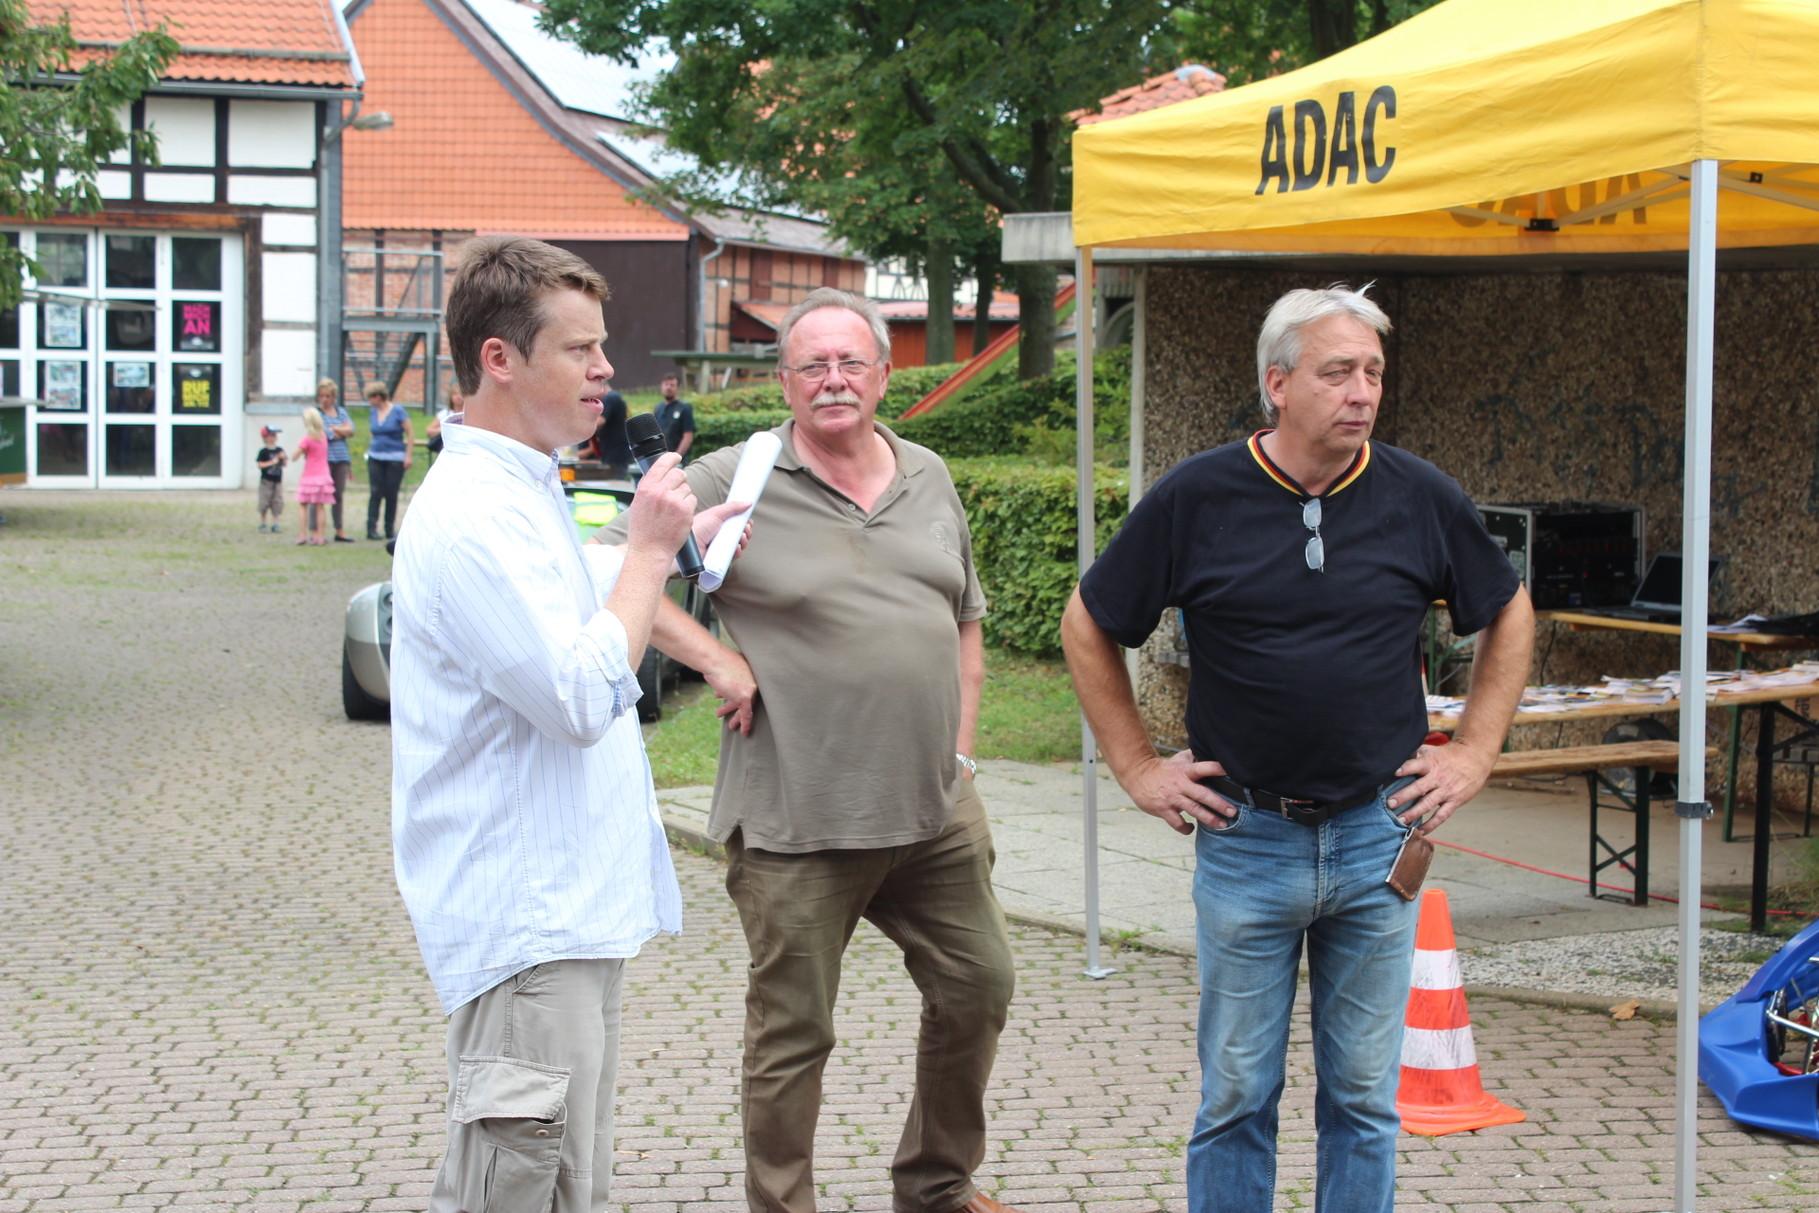 v.l.  Dr. Gunnar Breustedt,  Ortsvorsteher Gerd Schäfer, Ortsbrandmeister Rüdiger Becker